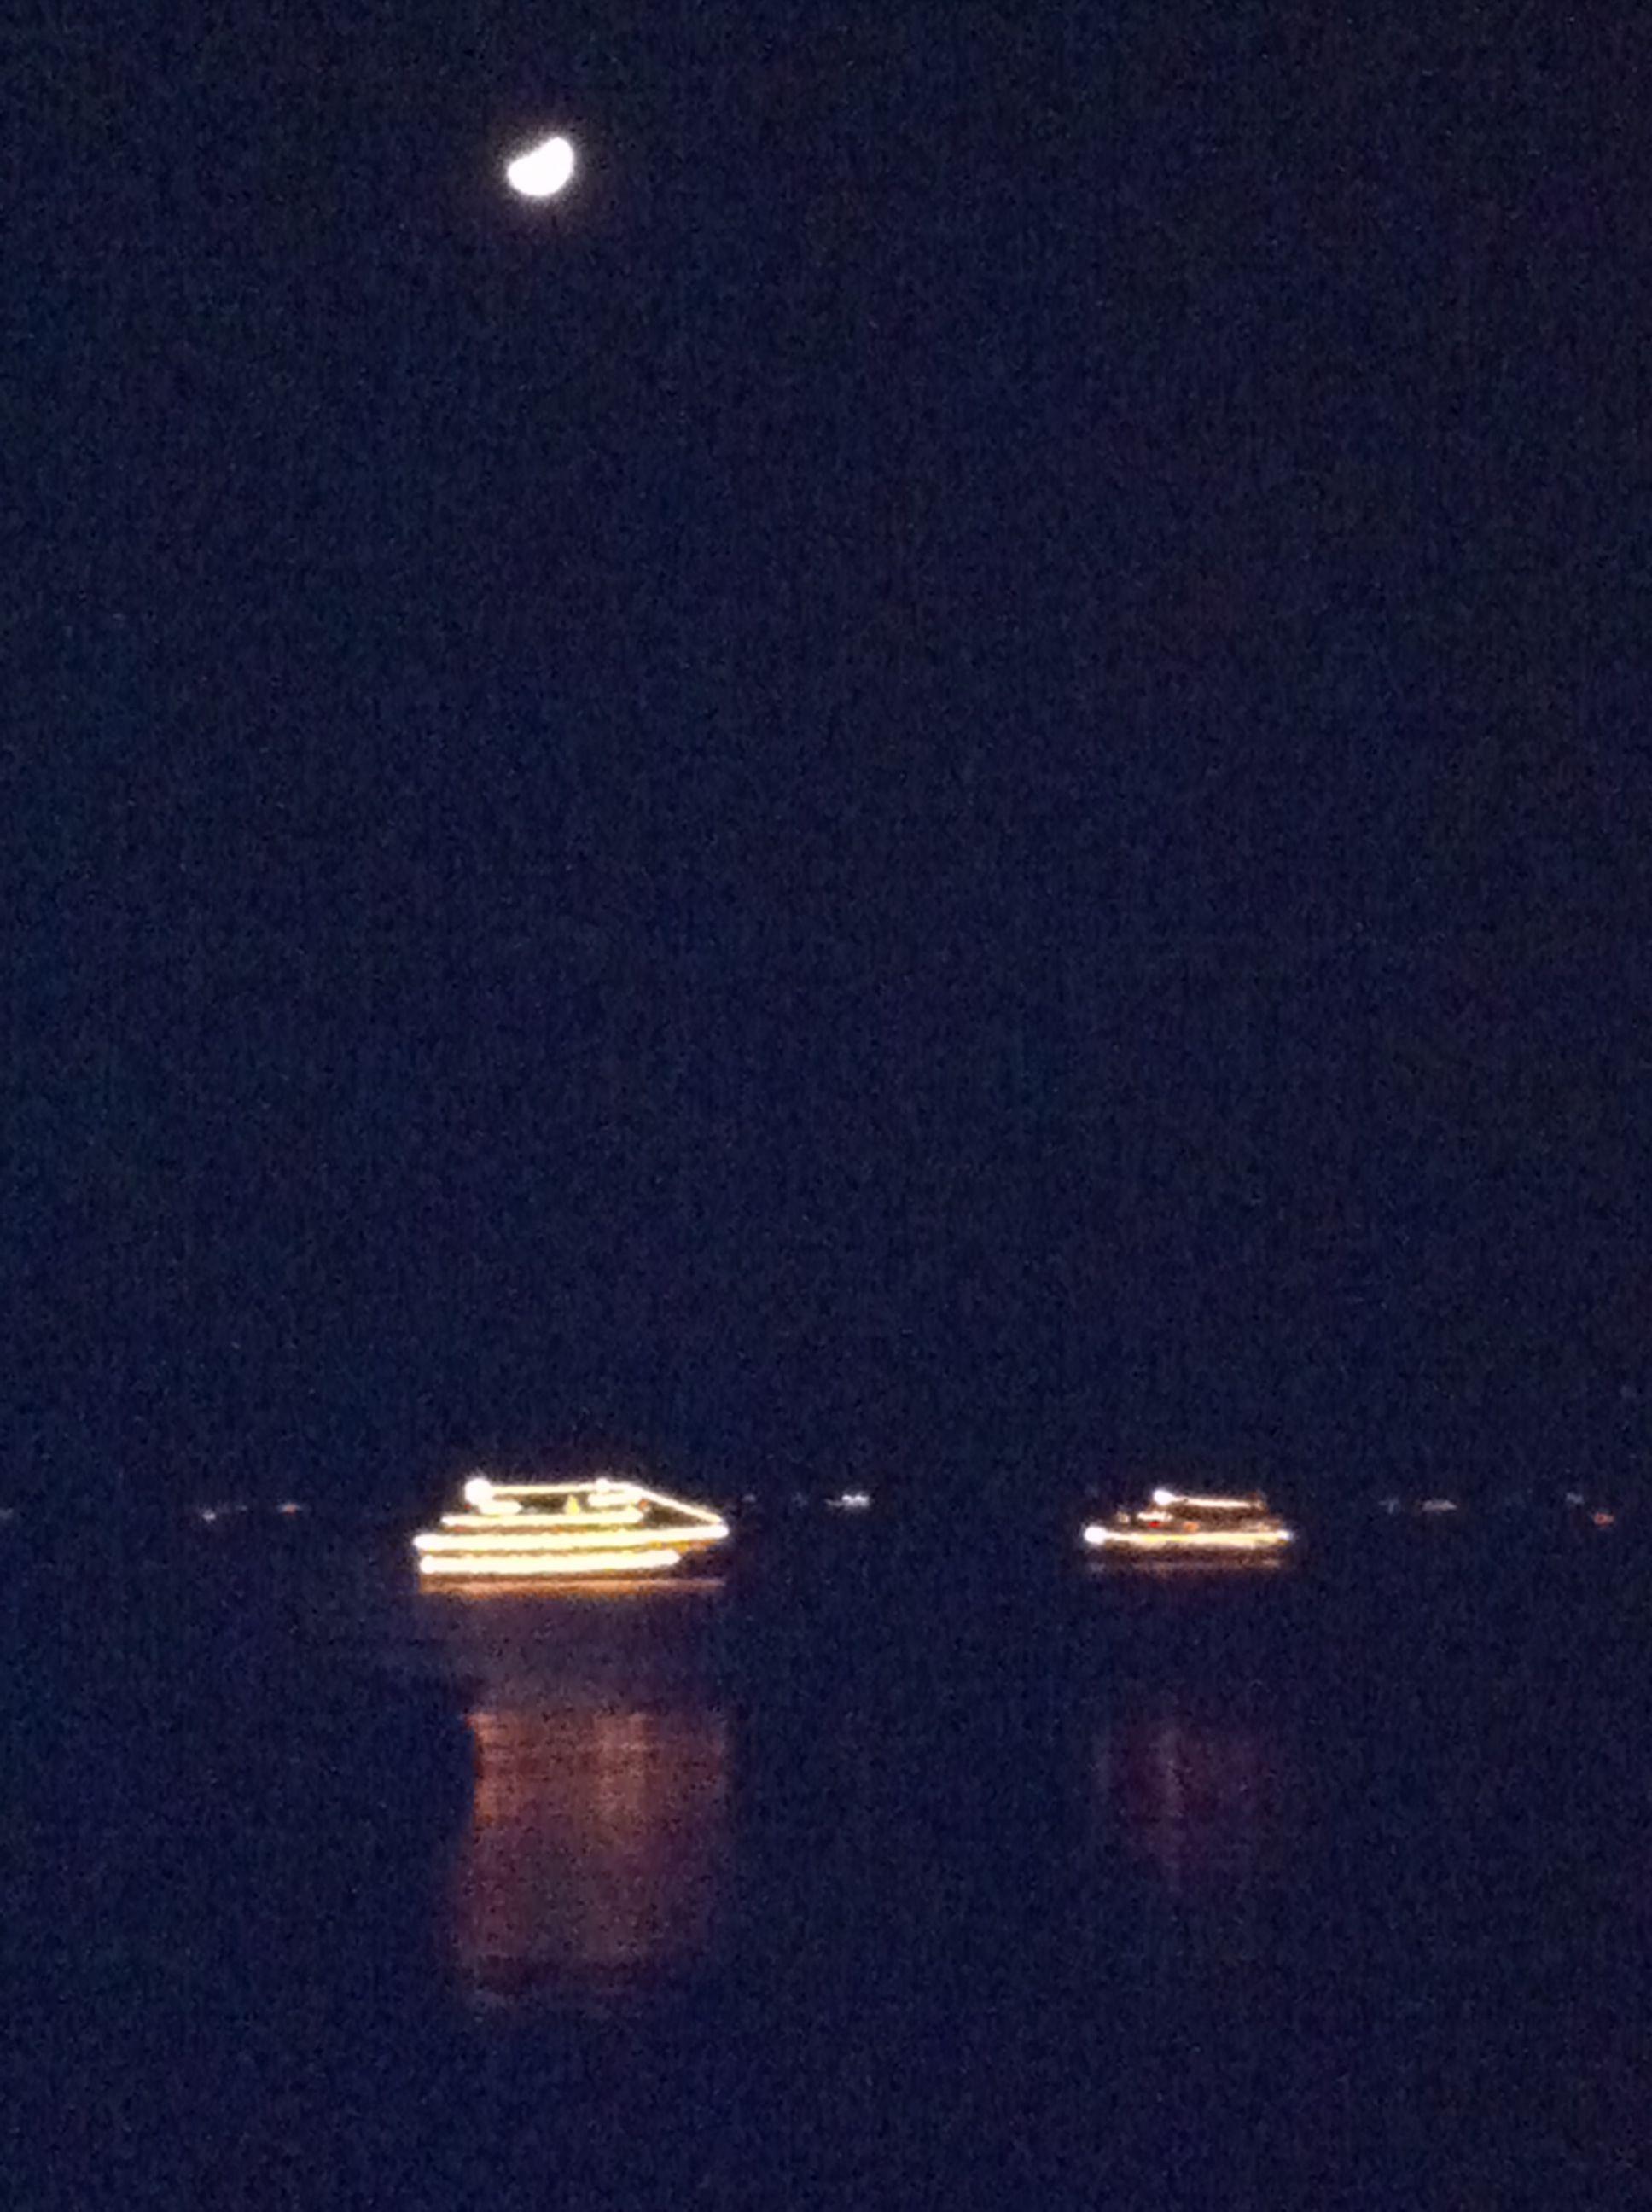 argosy christmas ships on liberty bay poulsbo washington december 2012 - Argosy Christmas Ships 2014